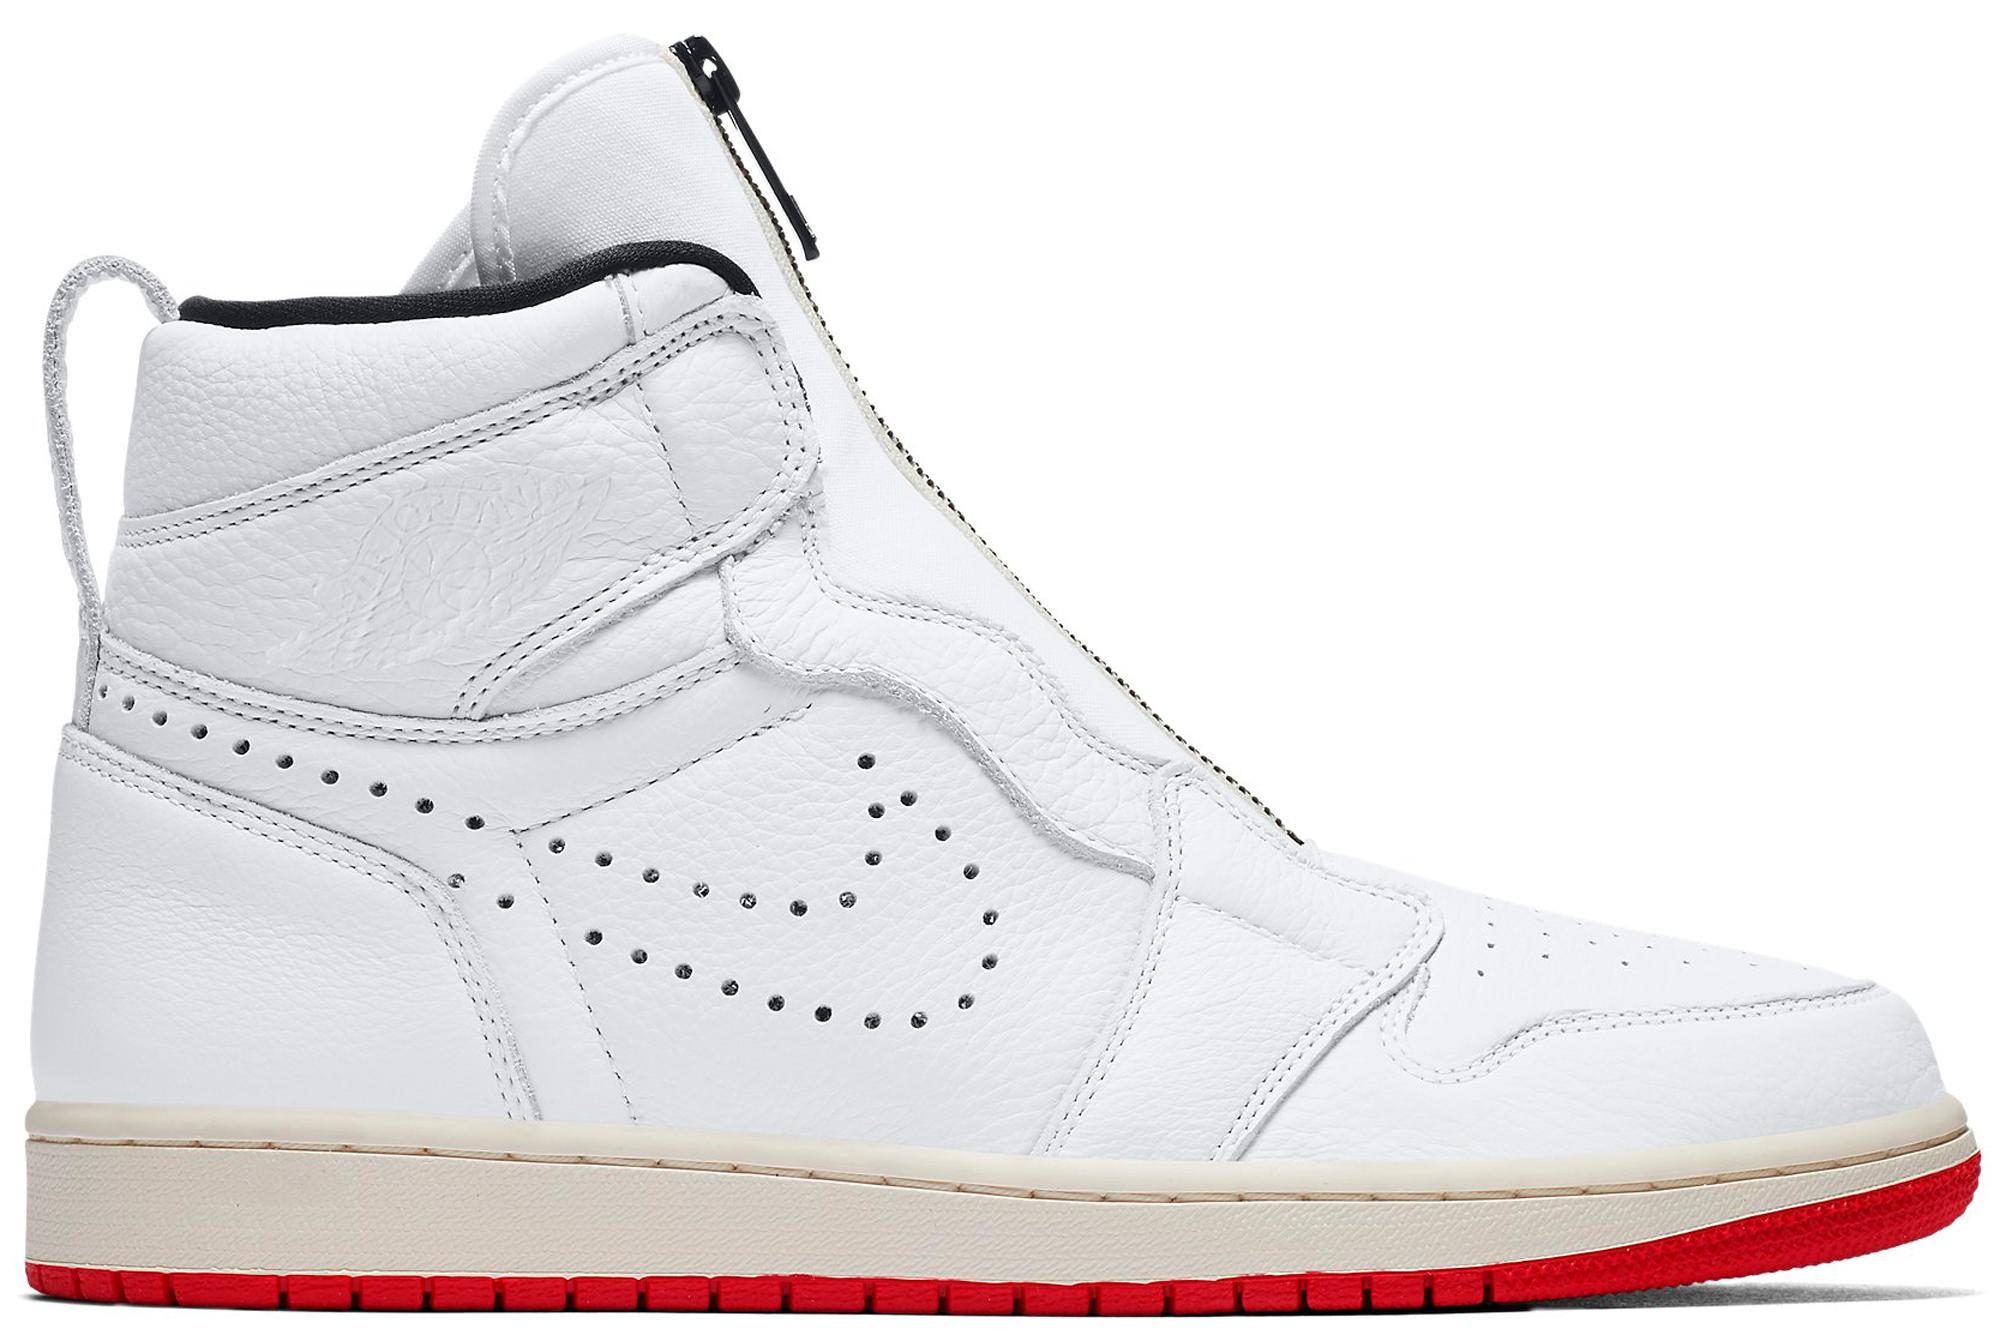 Jordan 1 Retro High Zip White